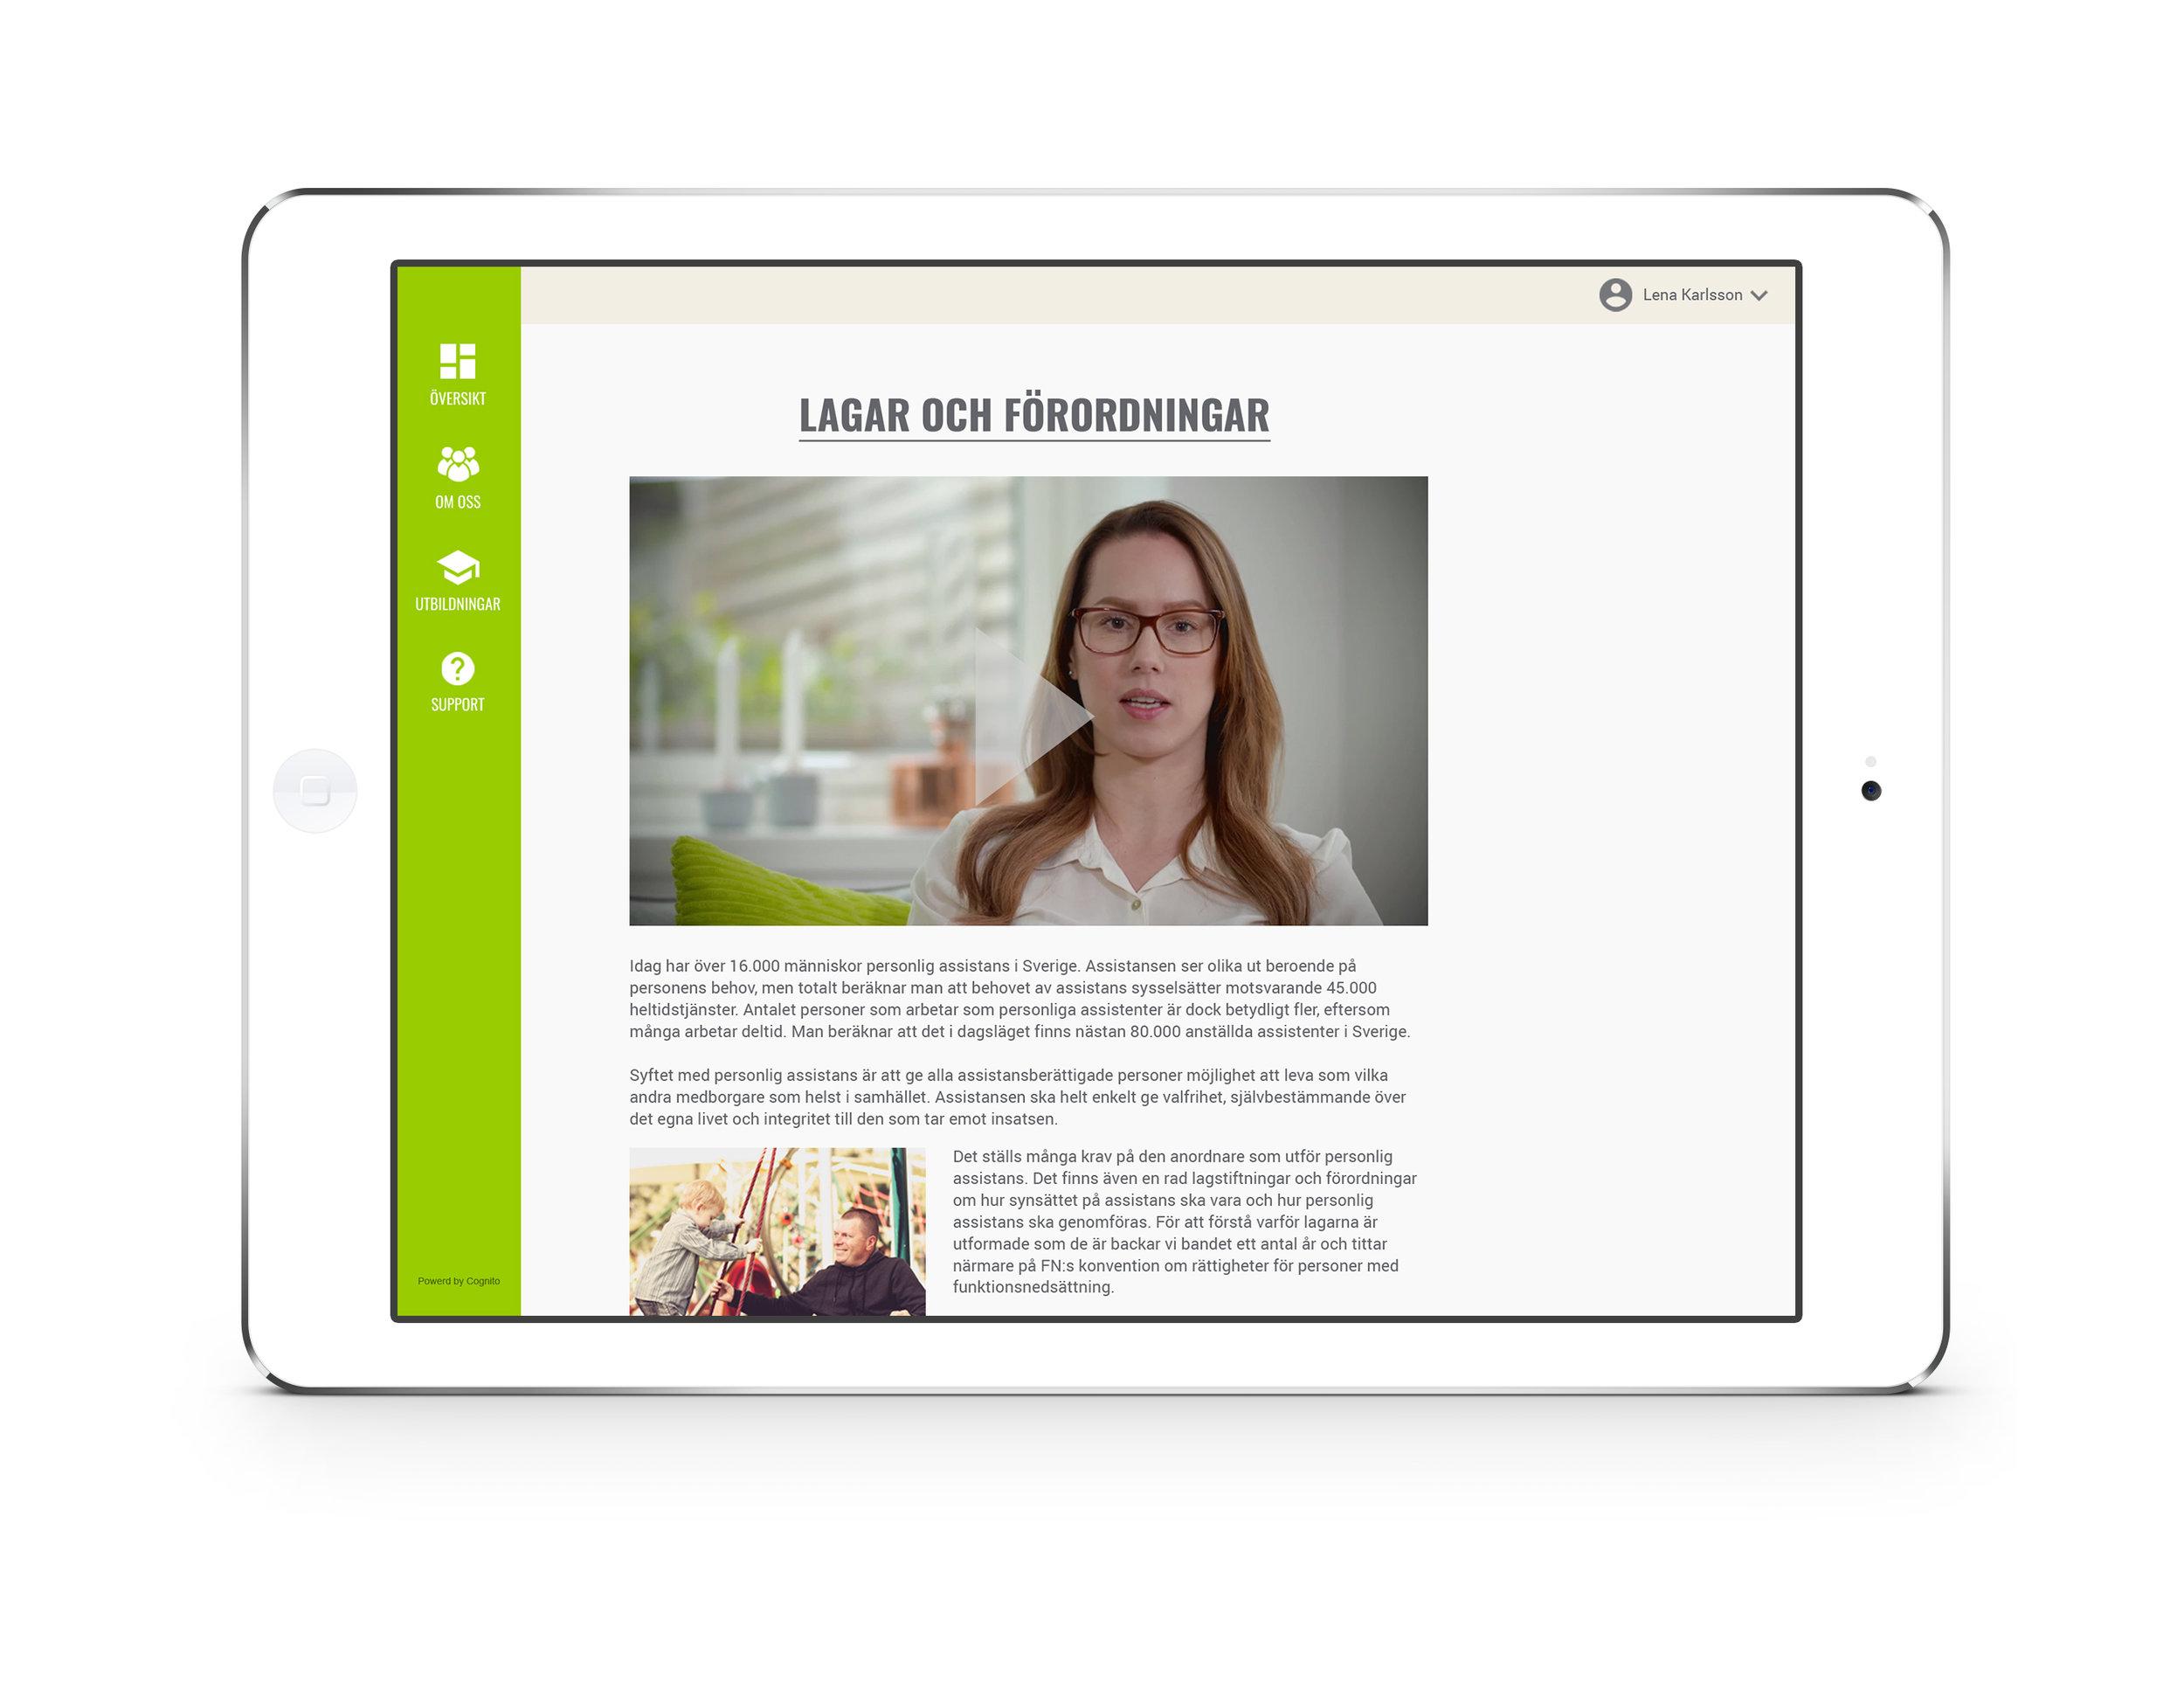 iPad-Air-Landscape-Mock-up_3.jpg